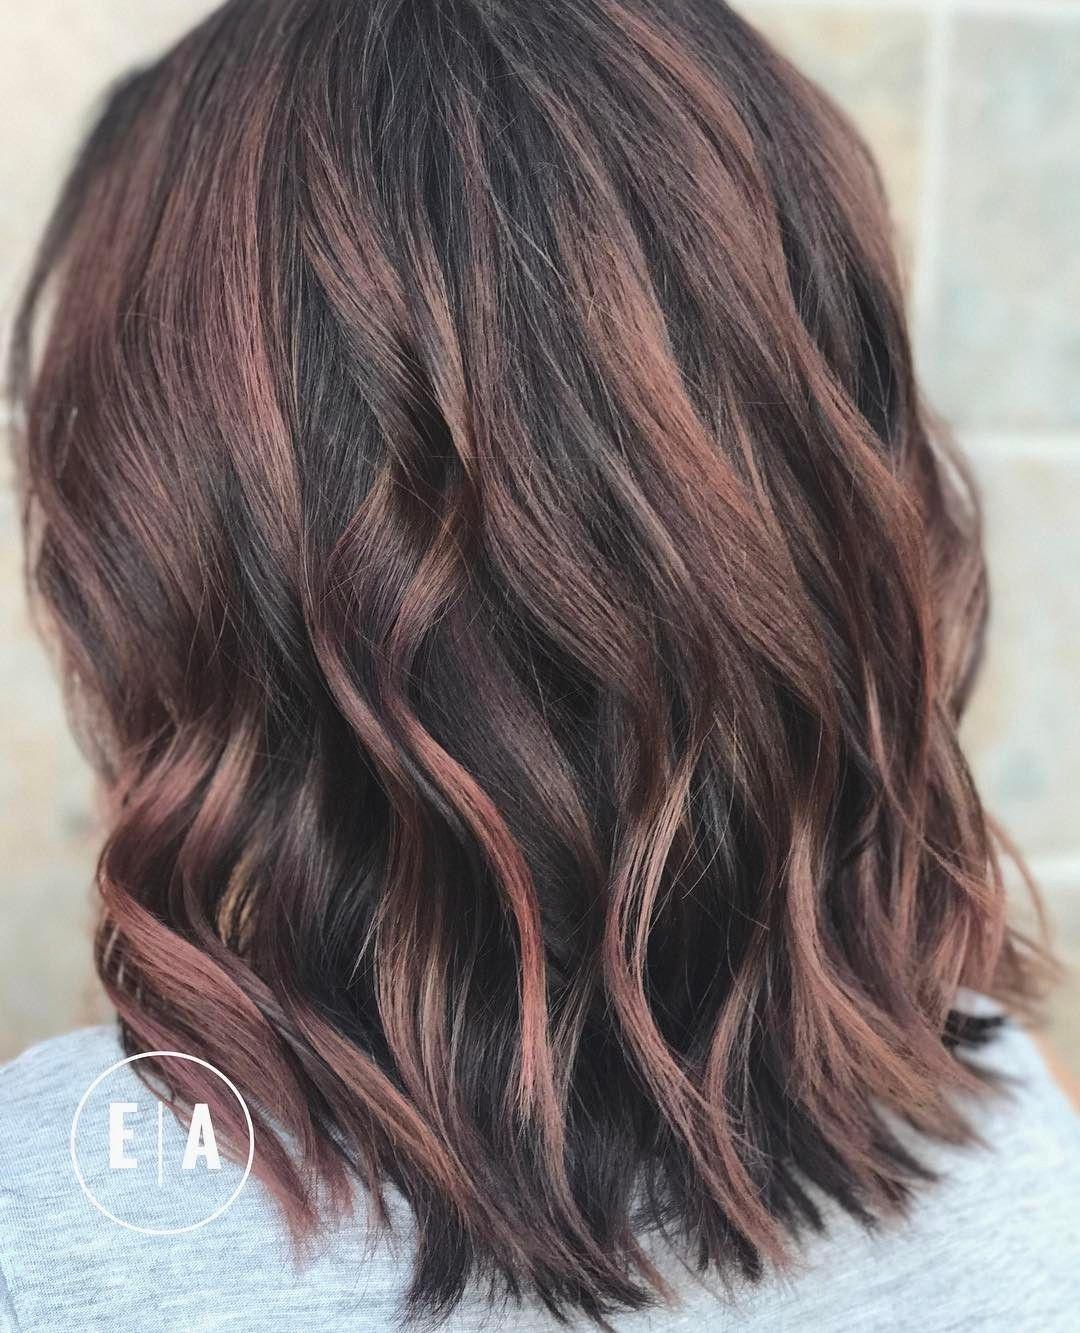 10 Cute Fun Red Hair Color Ideas 20 cute easy hairstyles for summer 2019 hottest summer hair color 2020